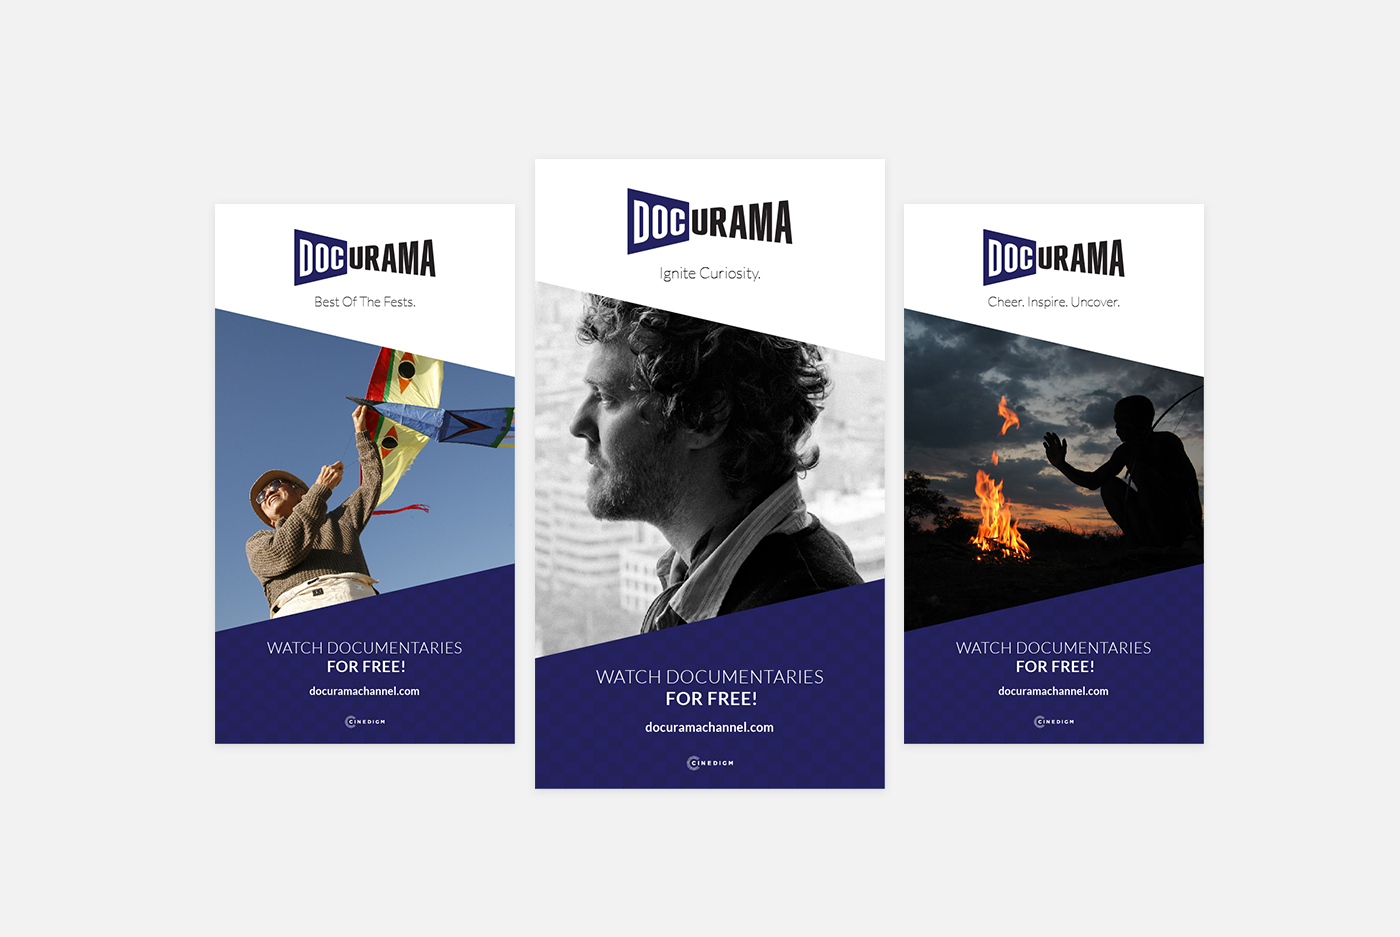 Docurama_posters